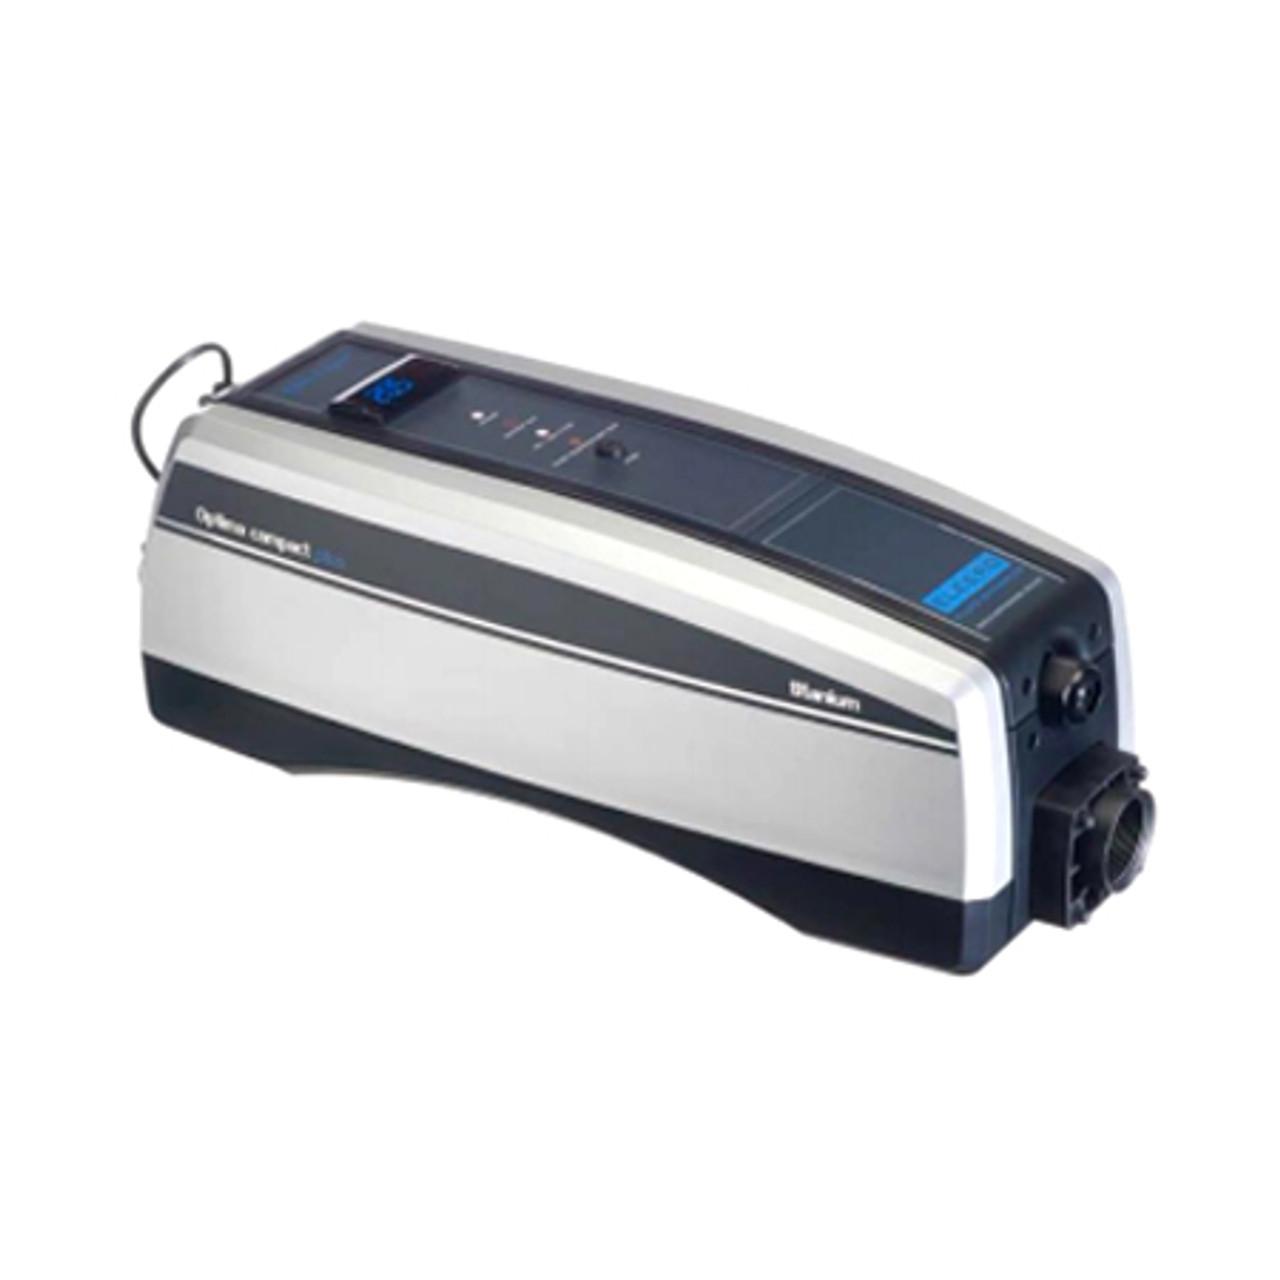 Optima Titanium Inline Heater 15kw, 220V, 3phase (HTIO-15-220-3)